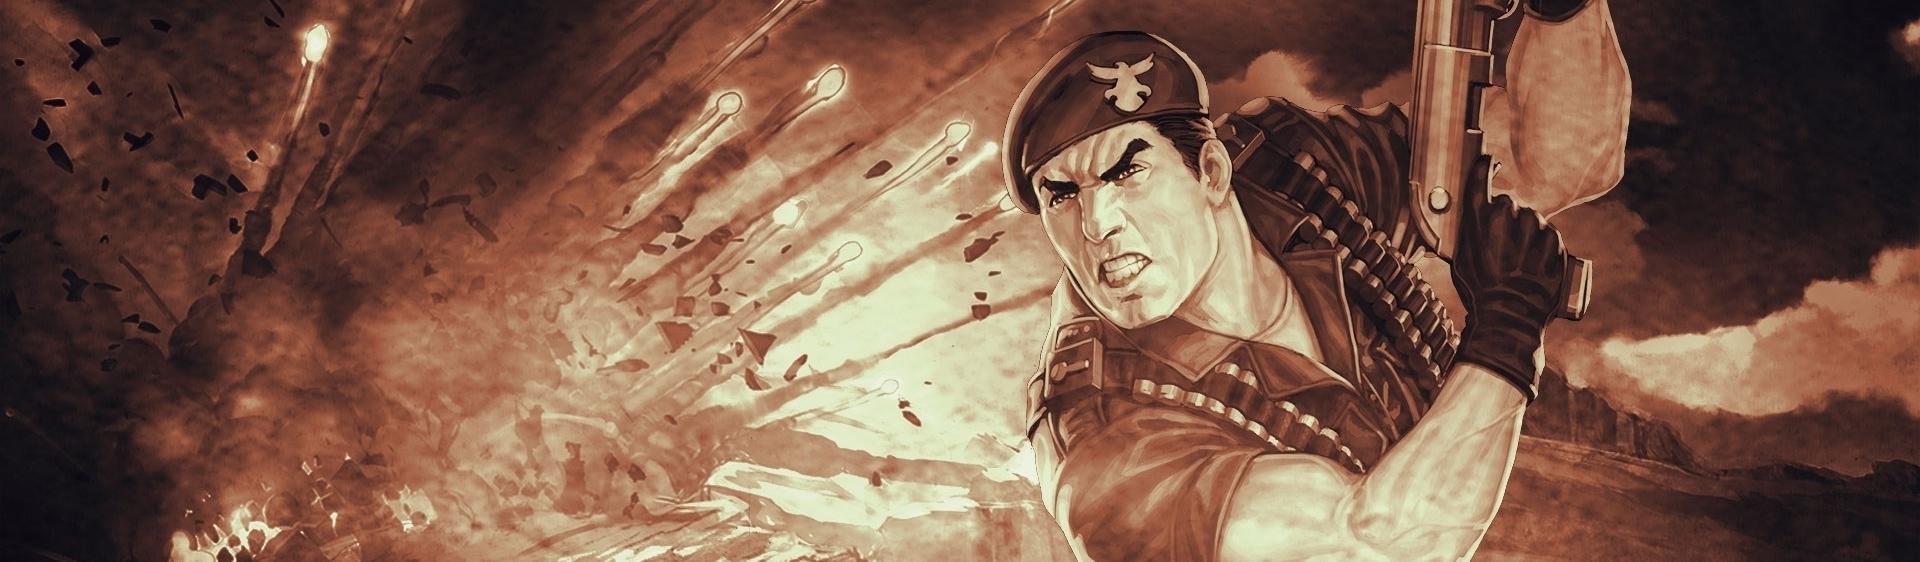 Modojo | G.I. Joe: Battleground